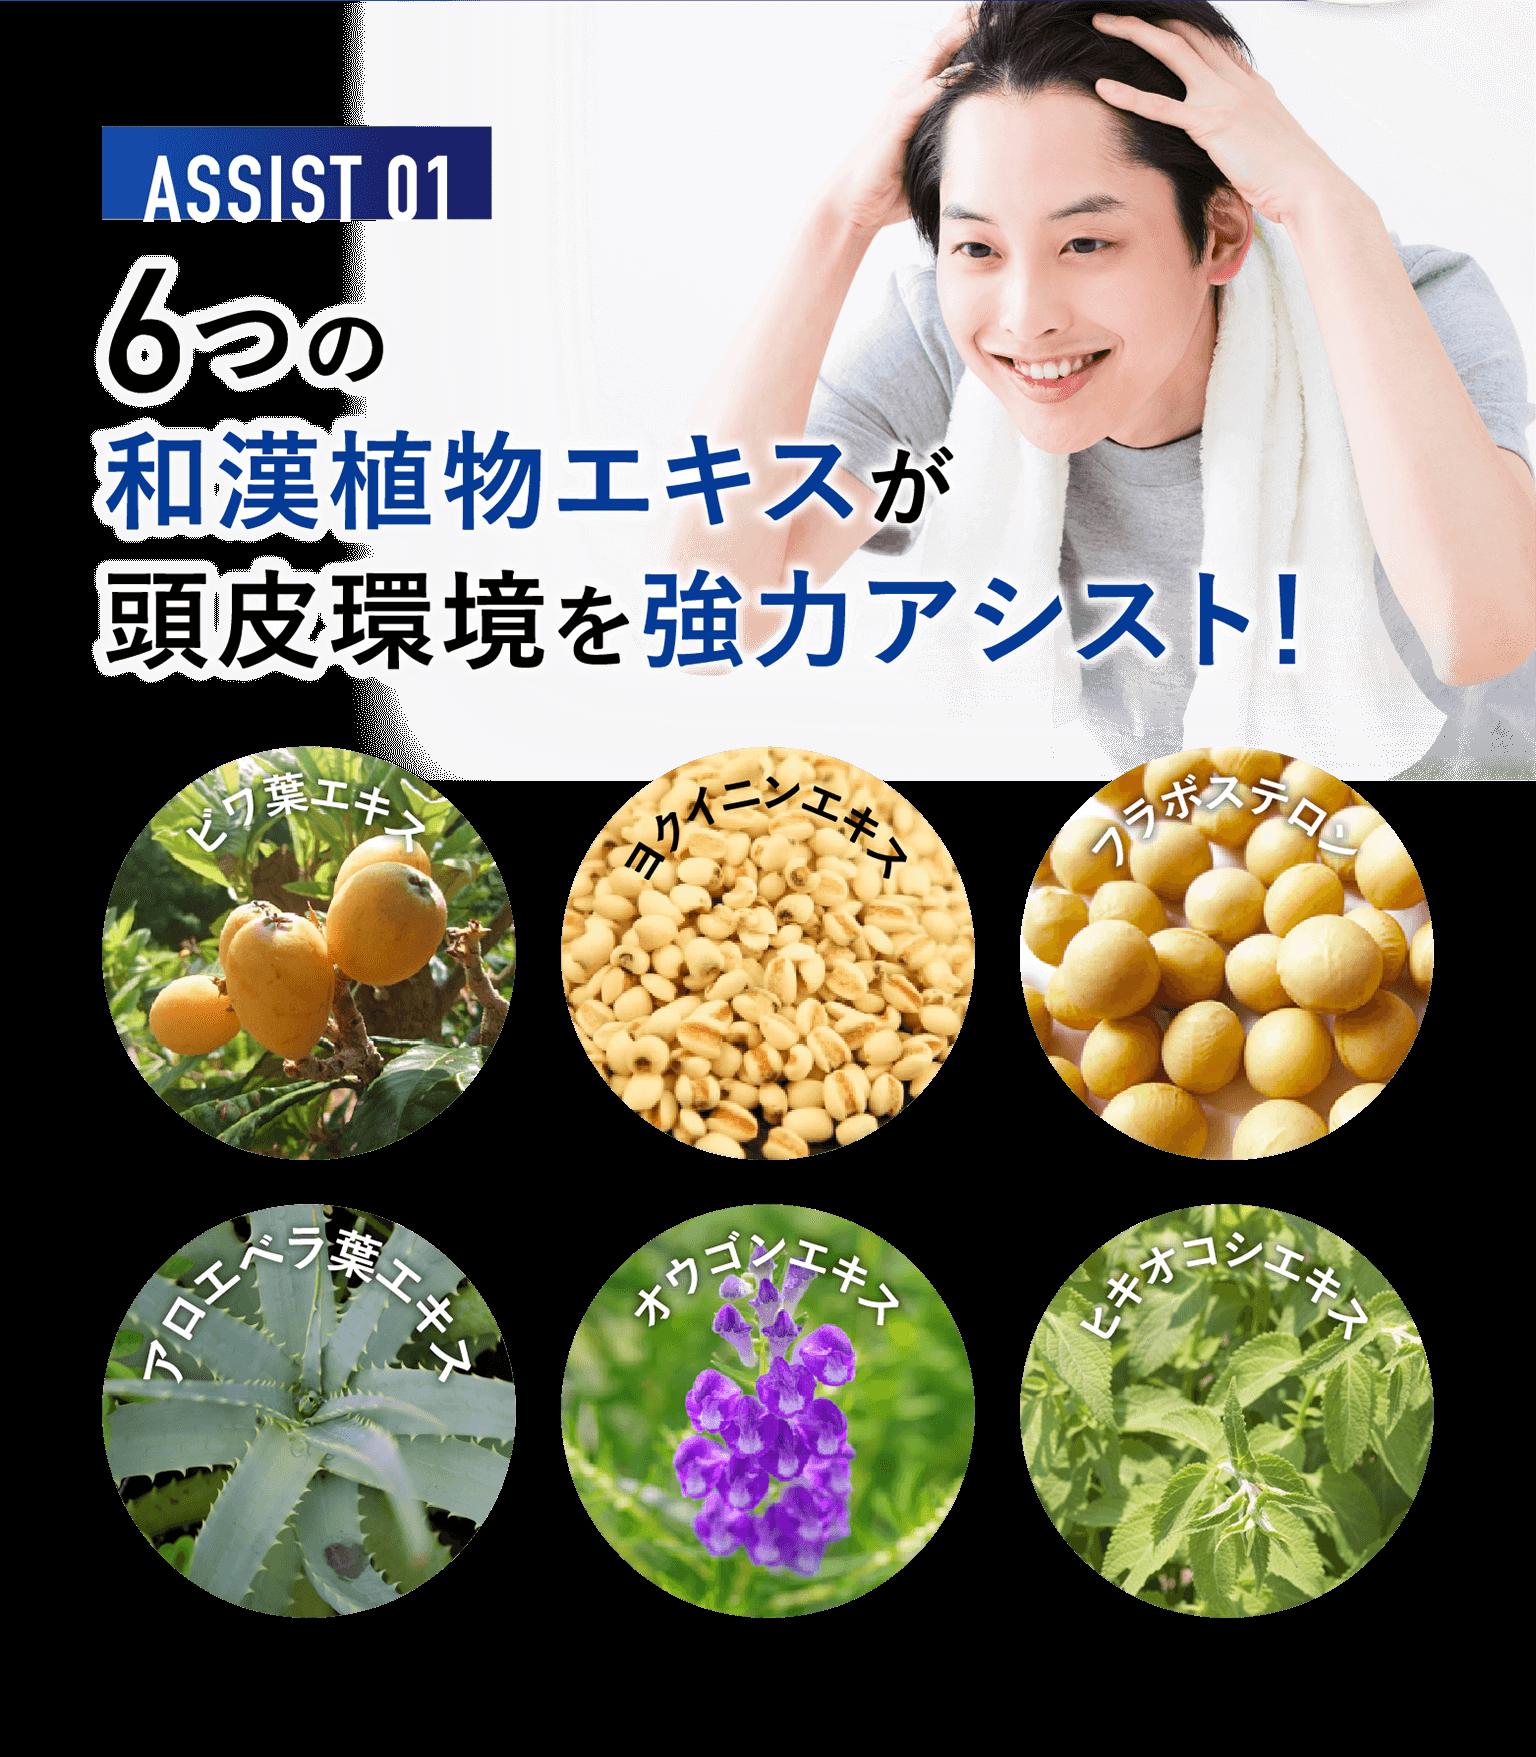 ASSIST01 6つの和漢植物エキスが頭皮環境を強力アシスト!ビワ葉エキス・ヨクイニンエキス・フラボステロン・アロエベラ葉エキス・オウゴンエキス・ヒキオコシエキス